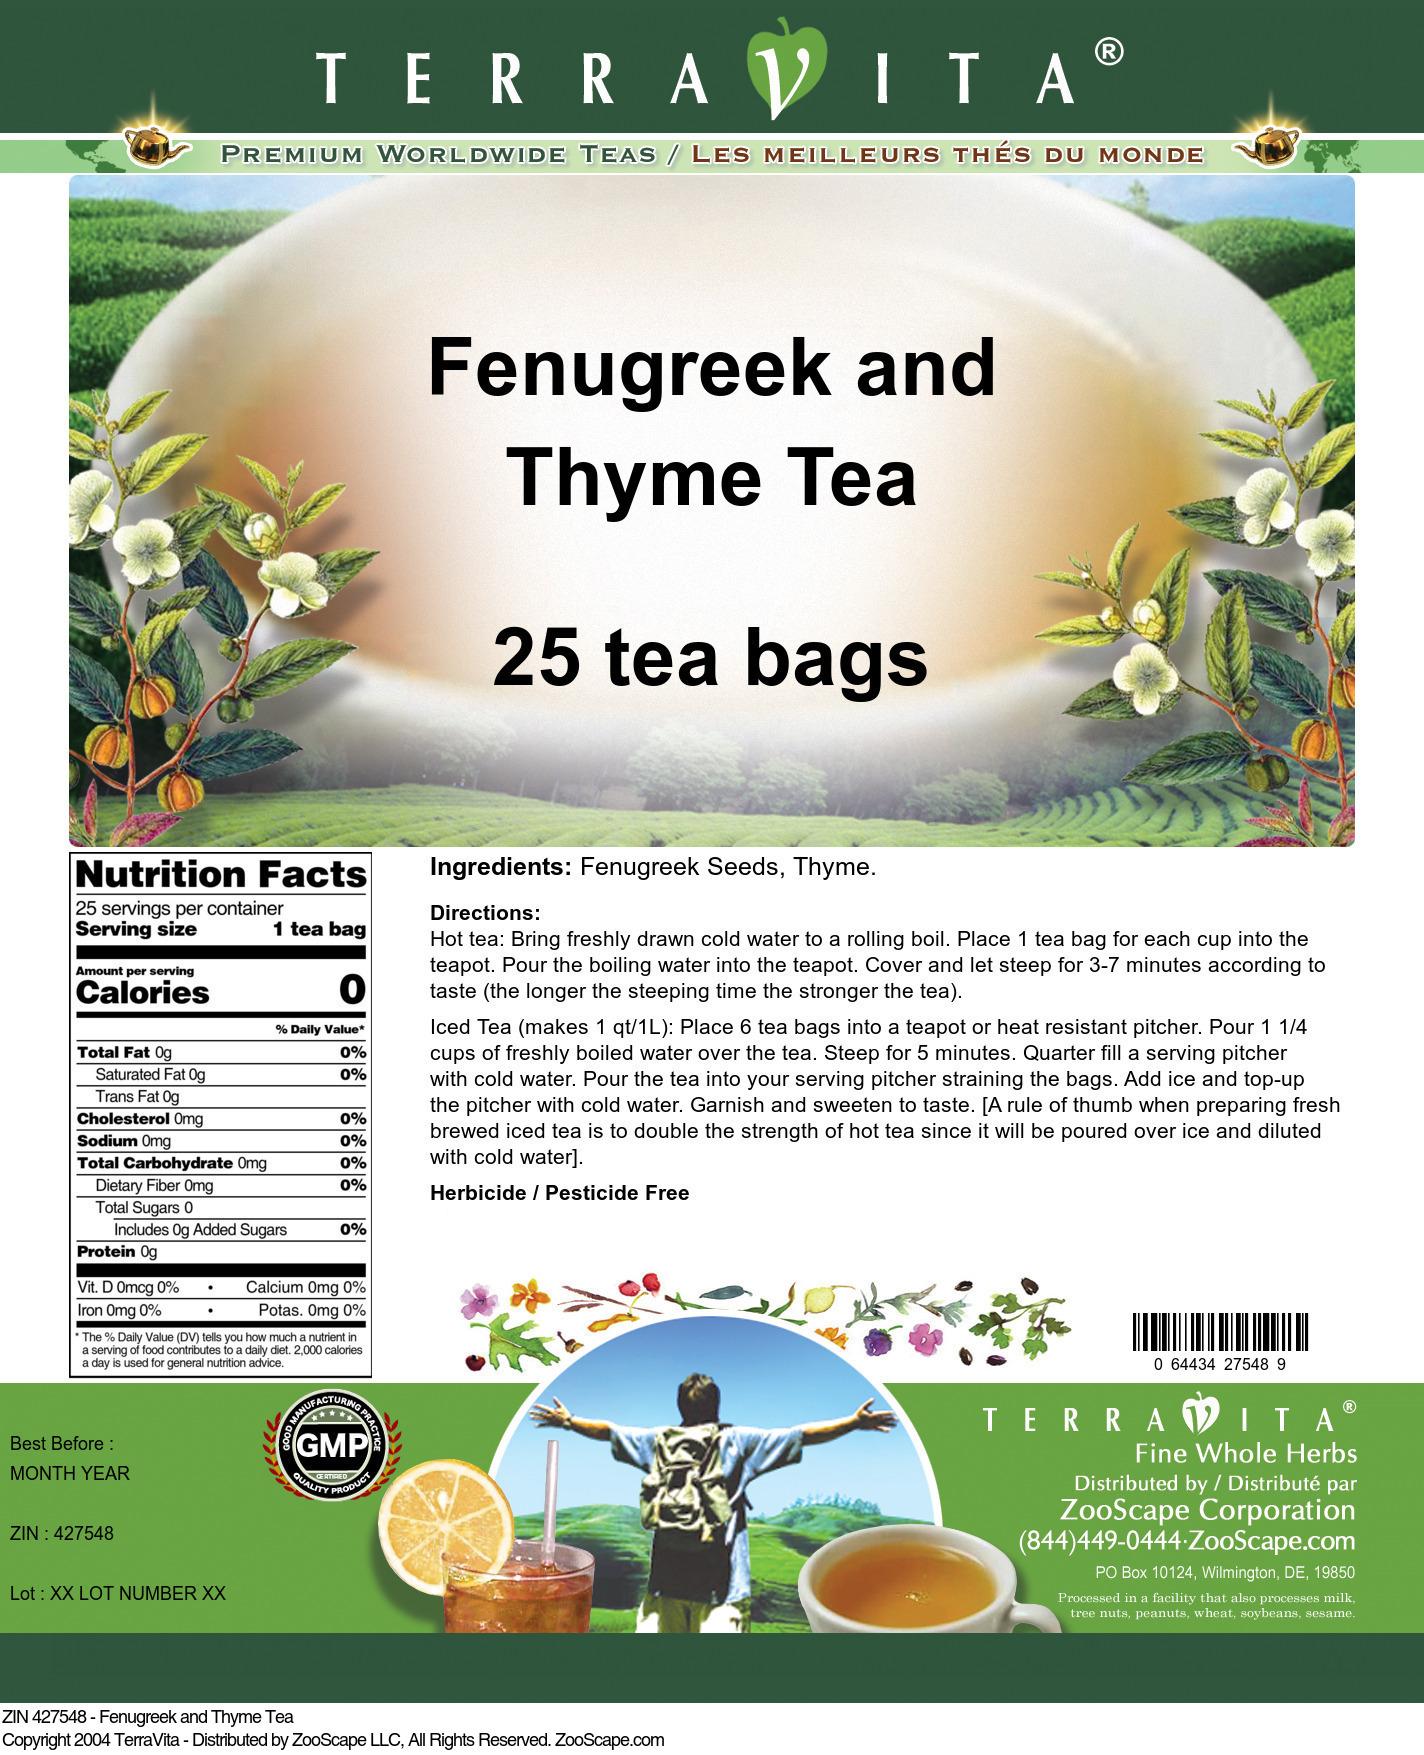 Fenugreek and Thyme Tea